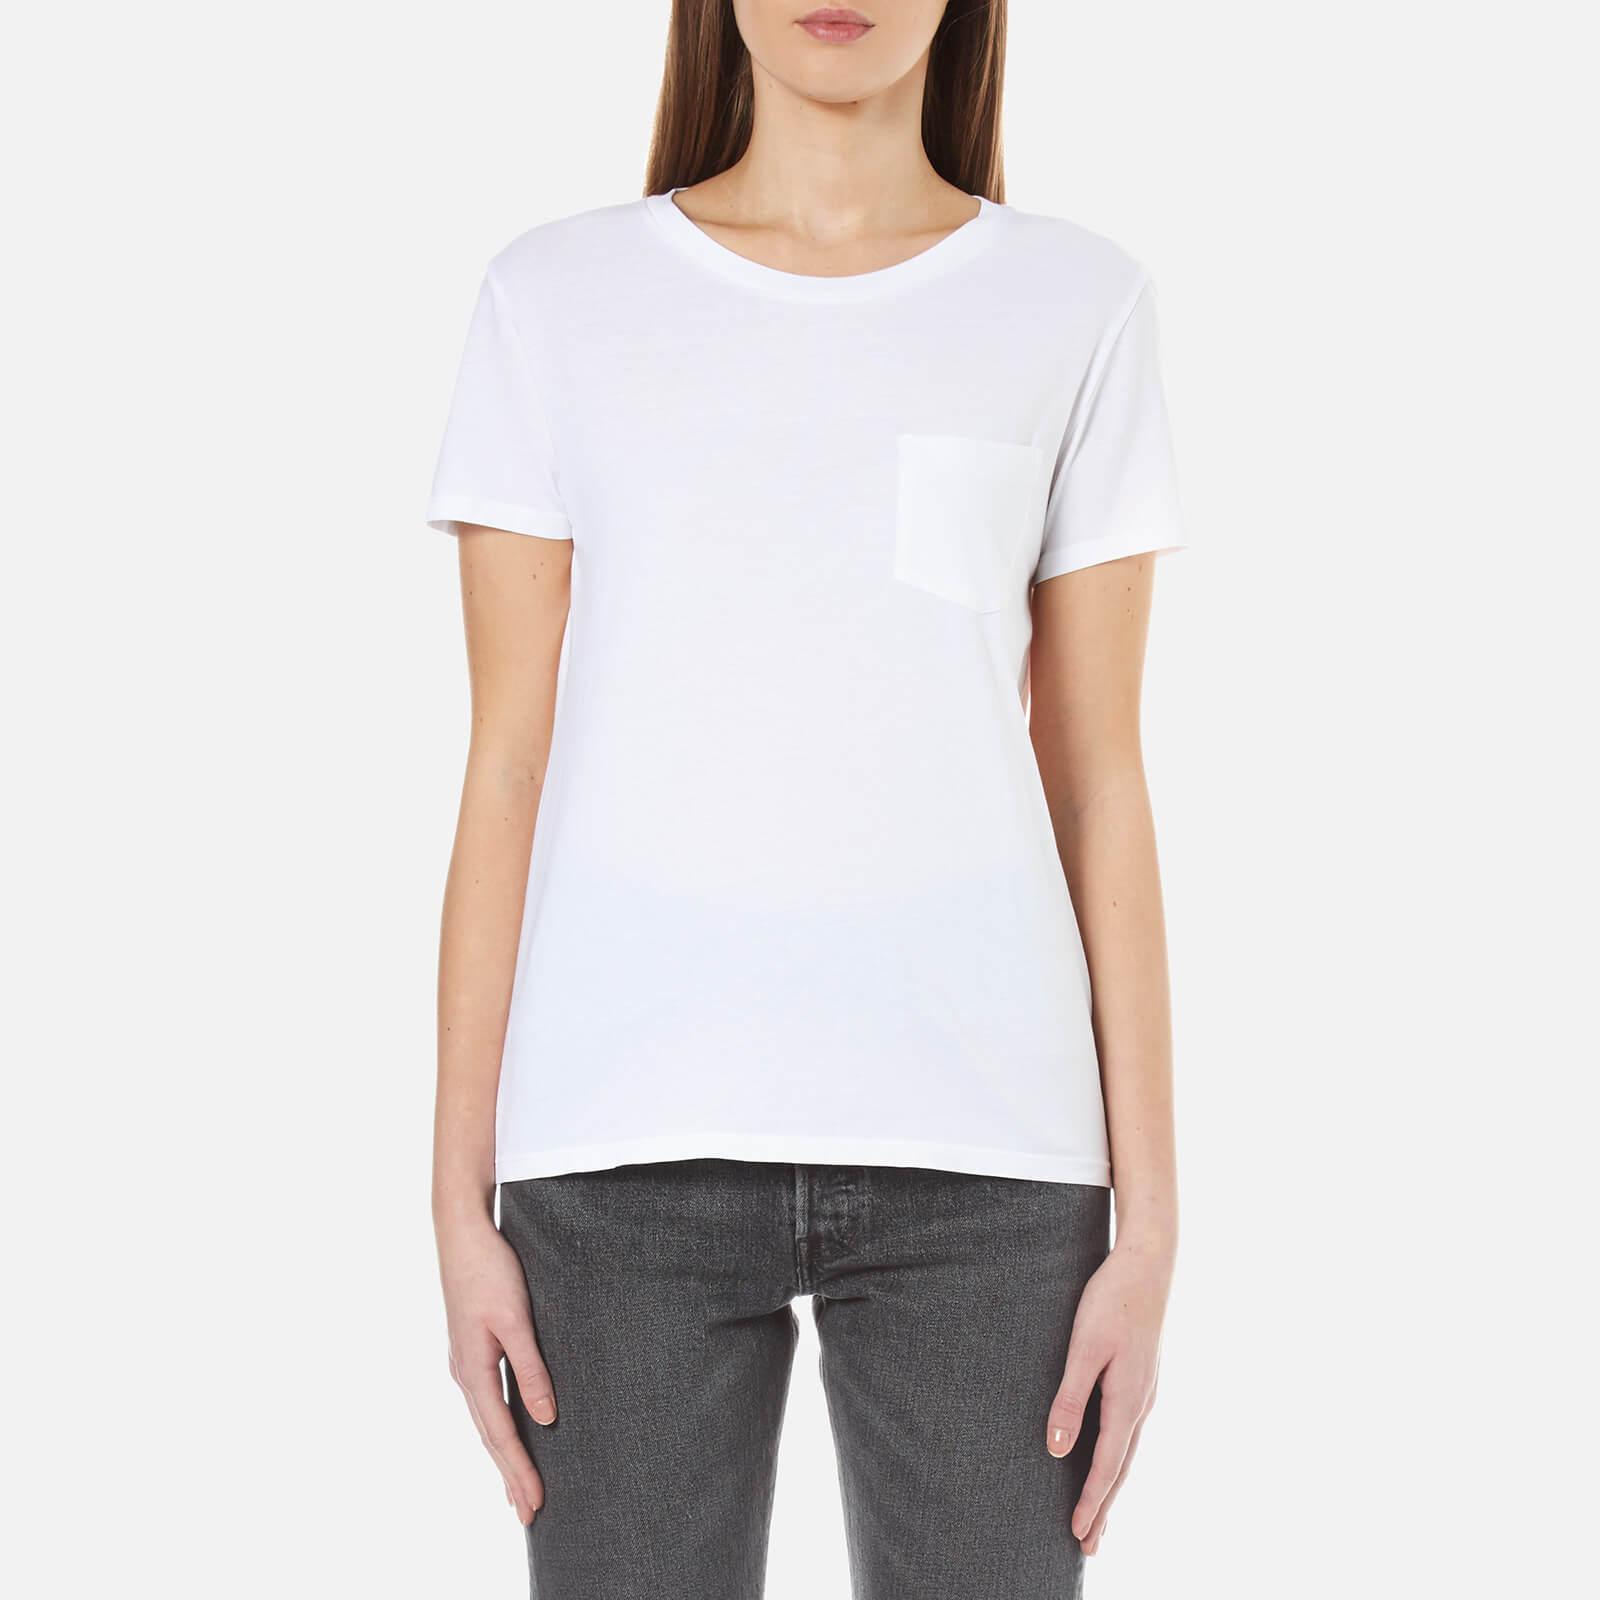 2f7229bf3e8d Levi's Women's The Perfect Crew T-Shirt - White Womens Clothing   TheHut.com